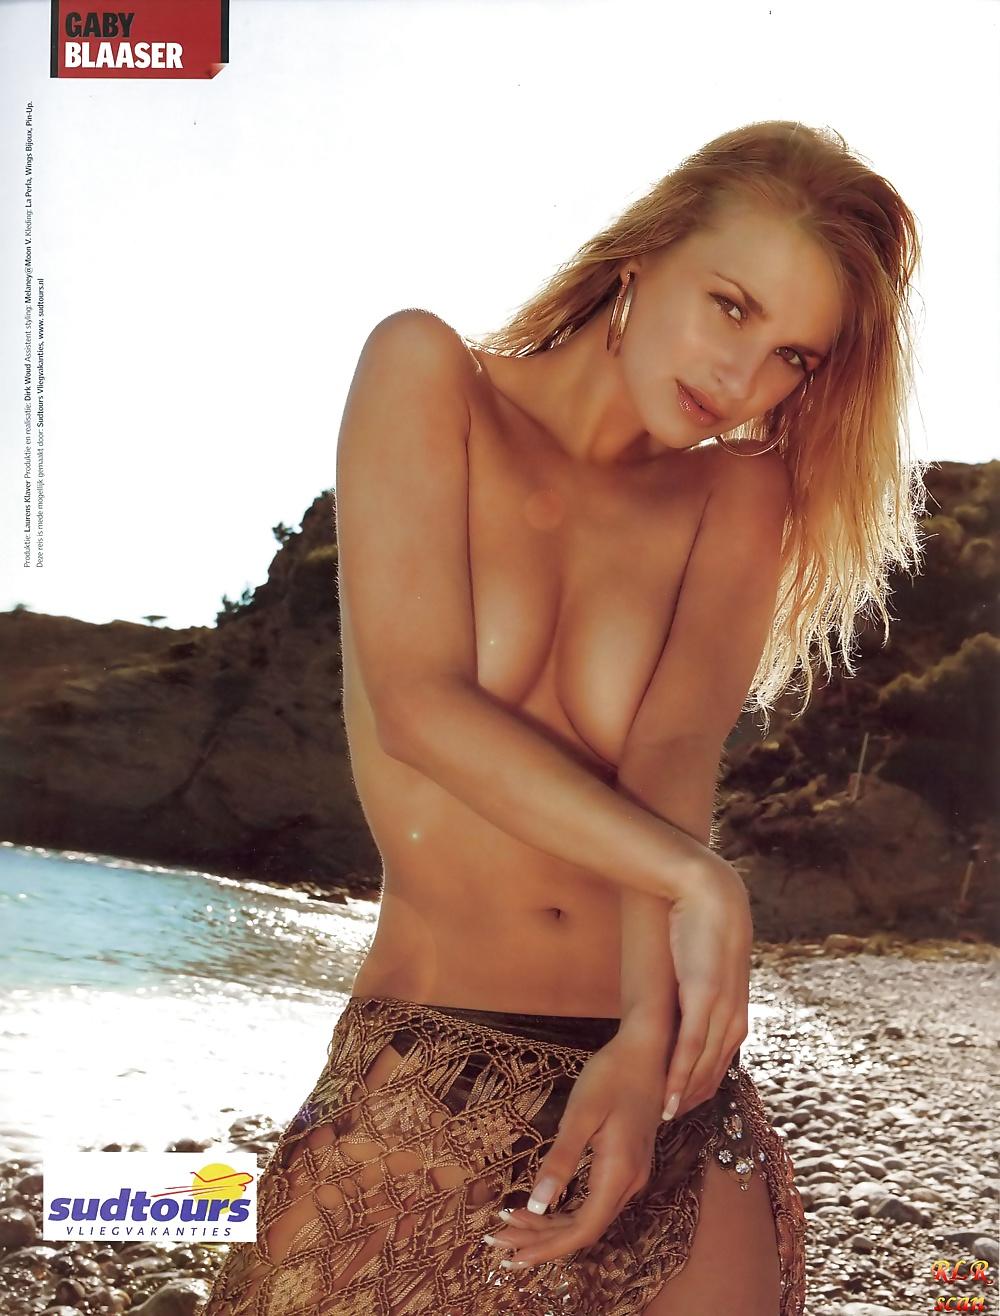 Gaby Blaaser  nackt